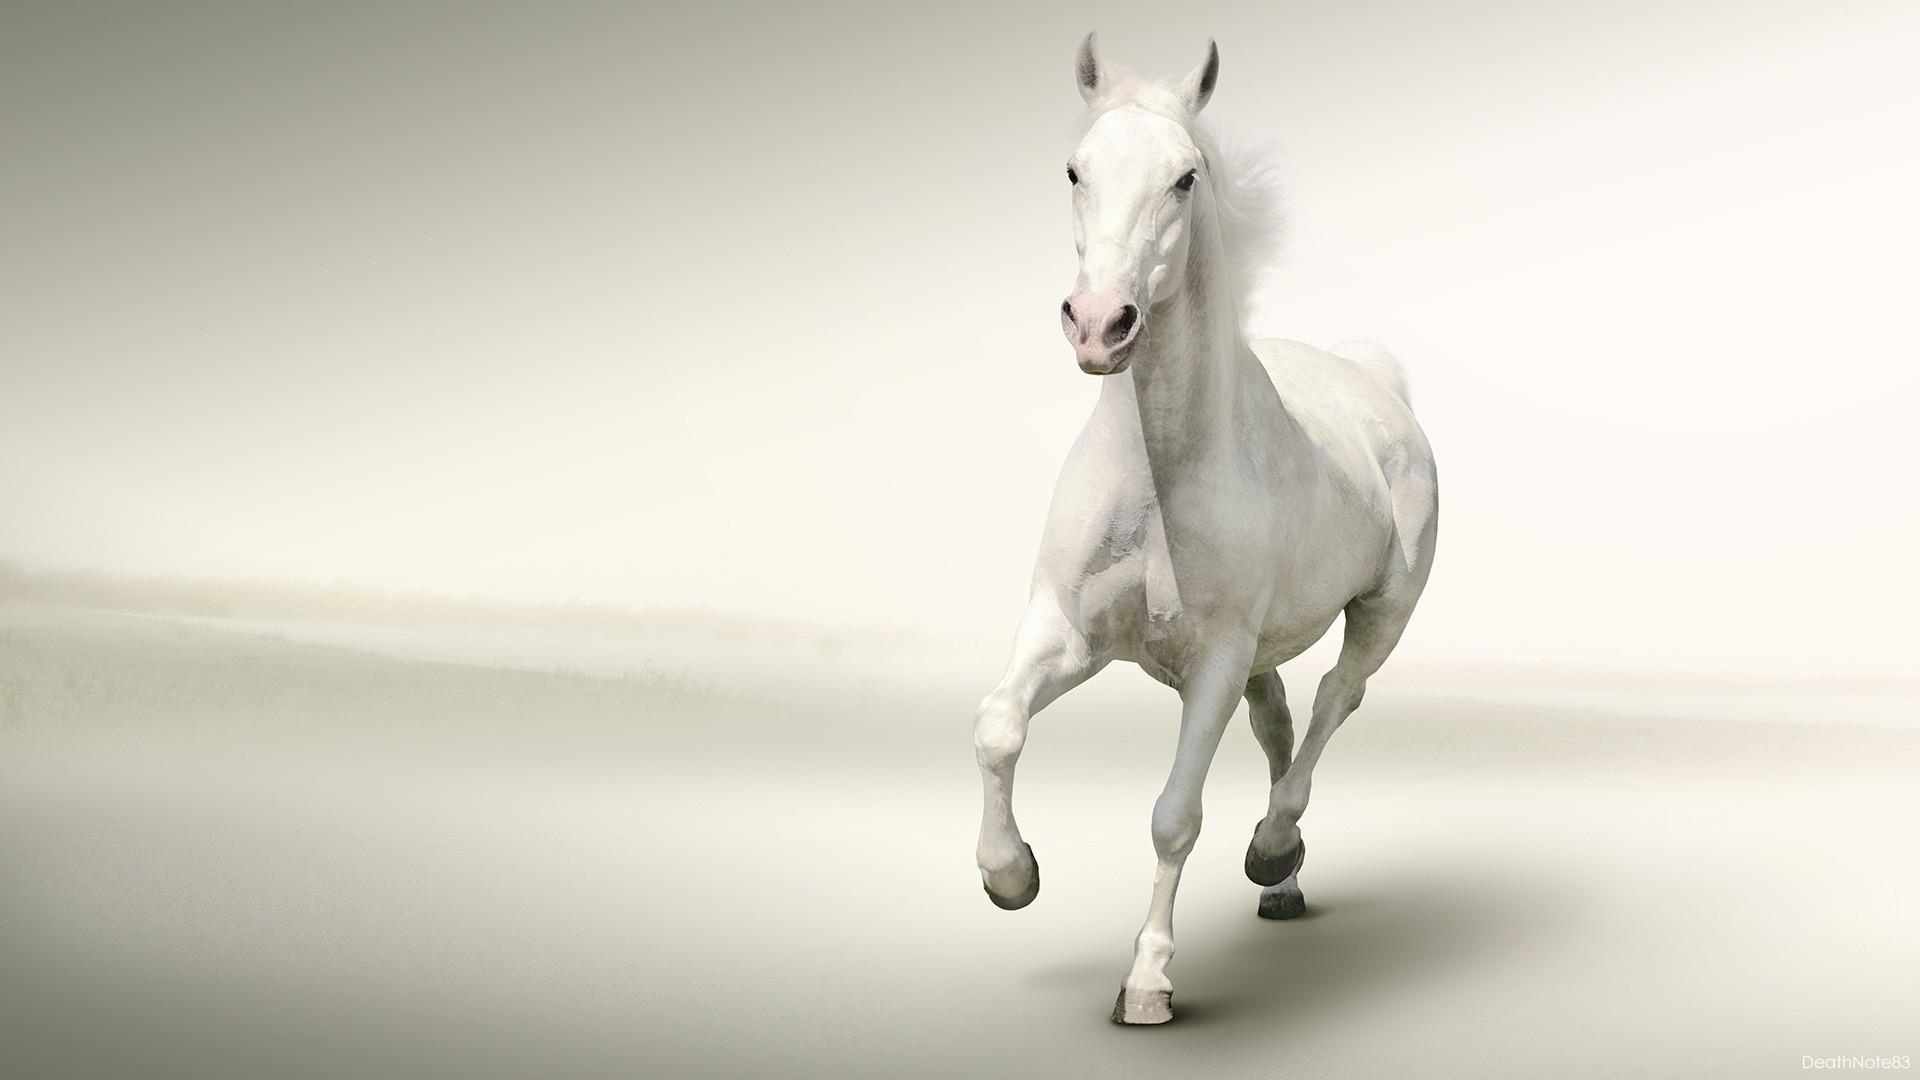 Hd wallpaper white background - White Horse Running White Background Hd Wallpaper Wallsev Com